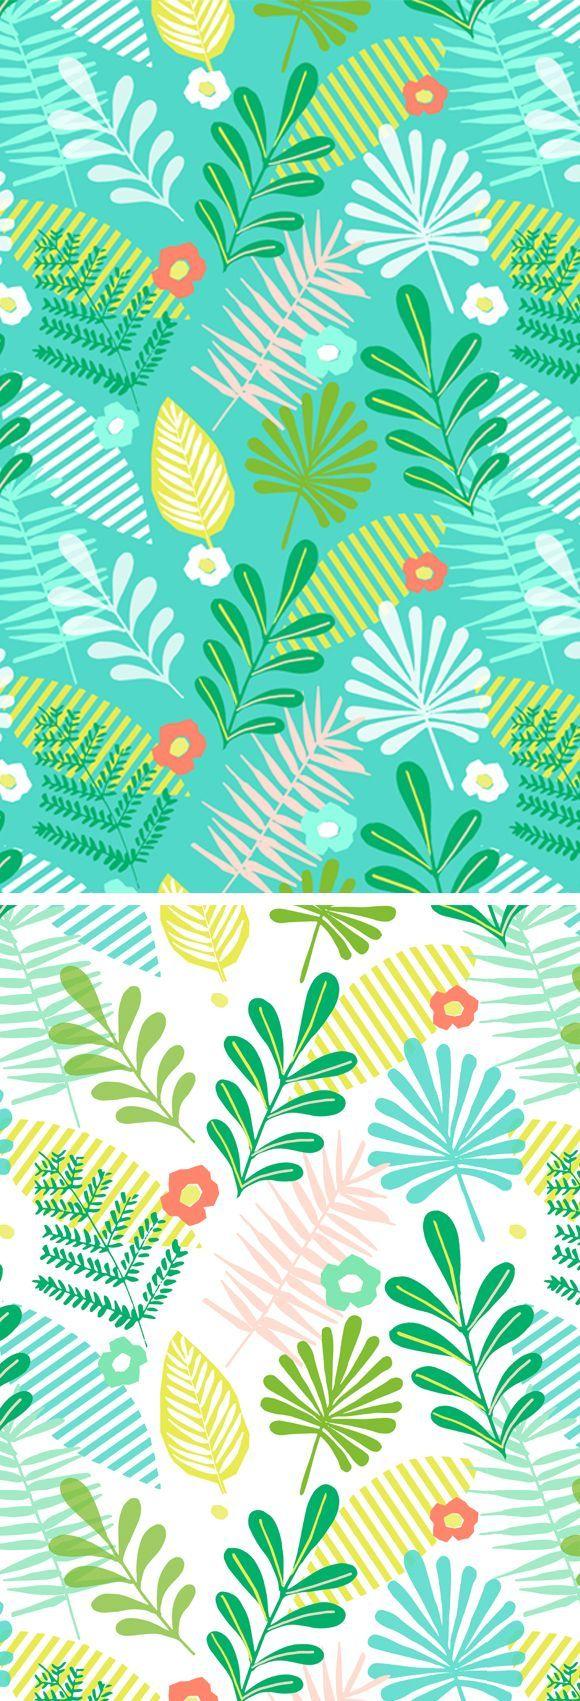 wendy kendall designs – freelance surface pattern designer » tropicalpalm-doc